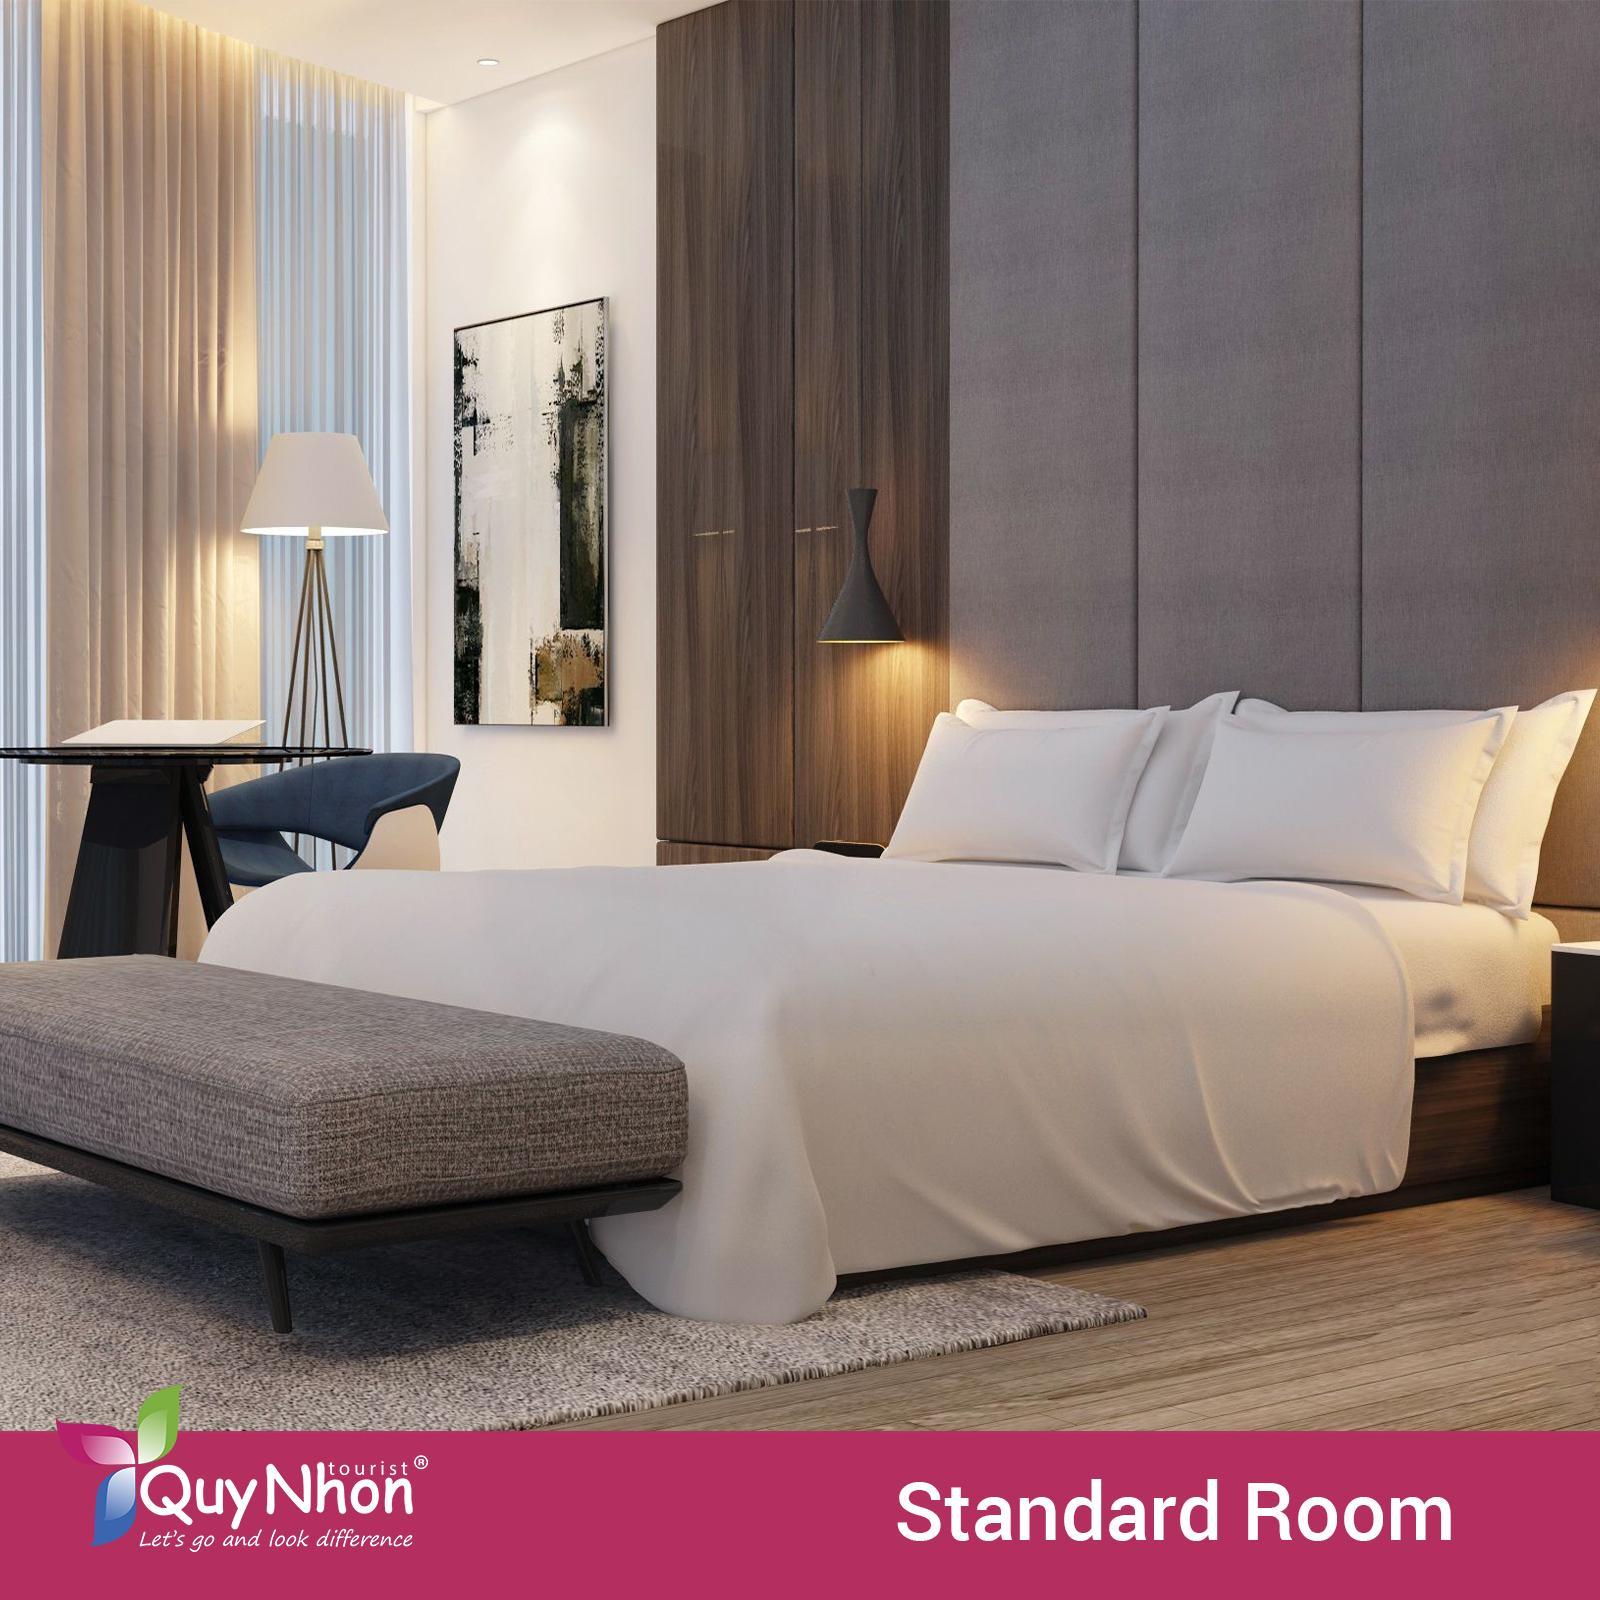 Meria Hotel Quy Nhơn - Standard Room.